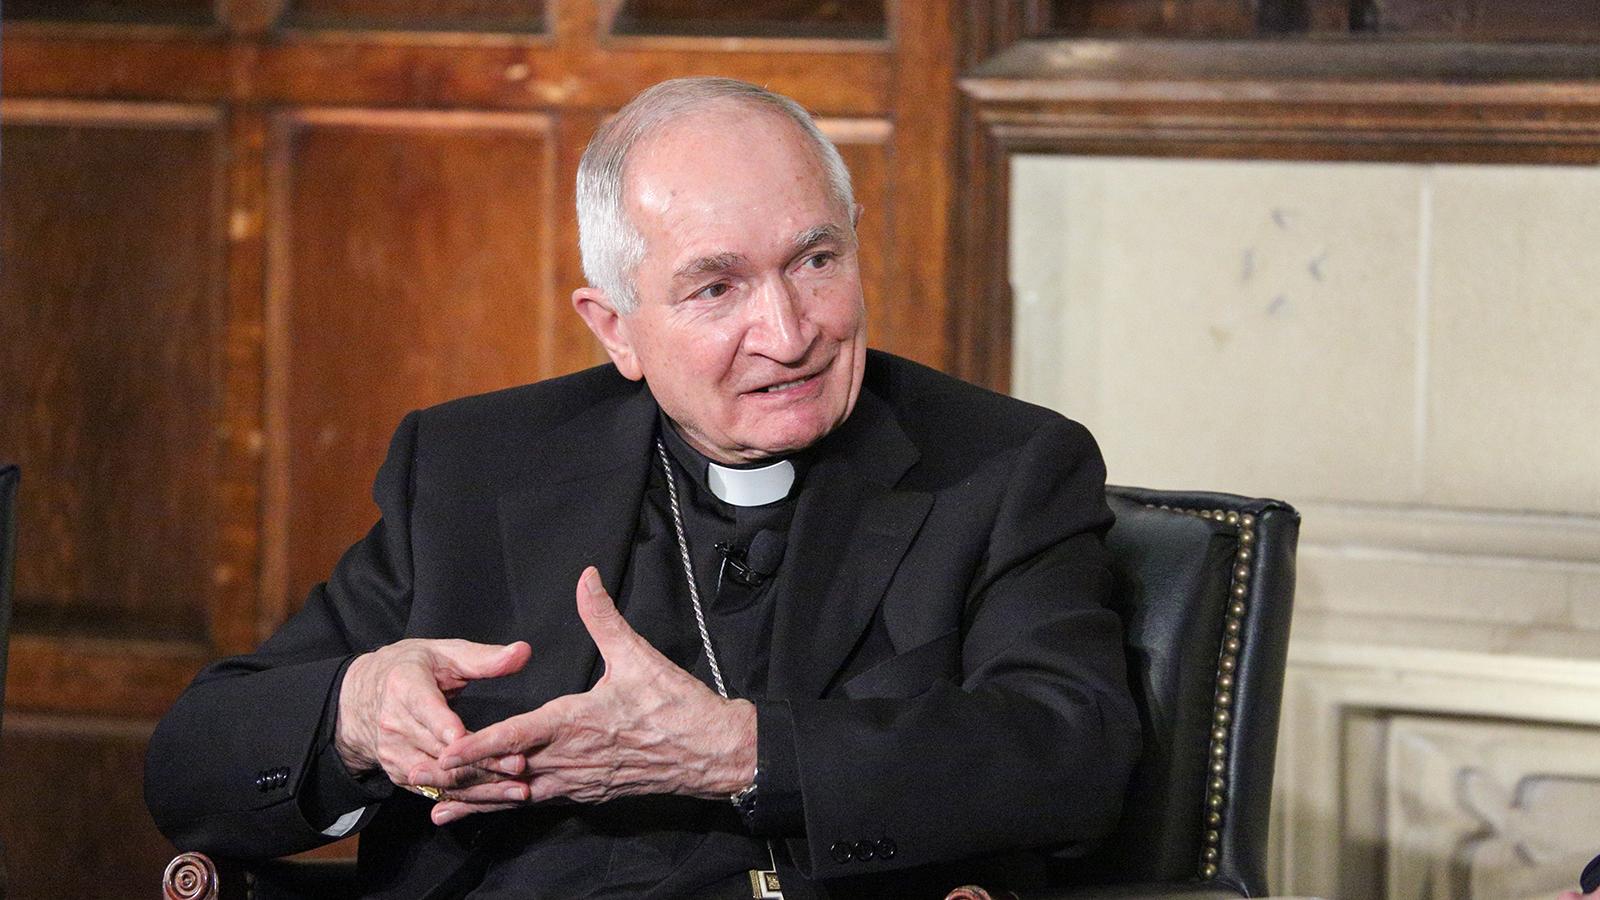 Archbishop Silvano Tomasi in conversation.